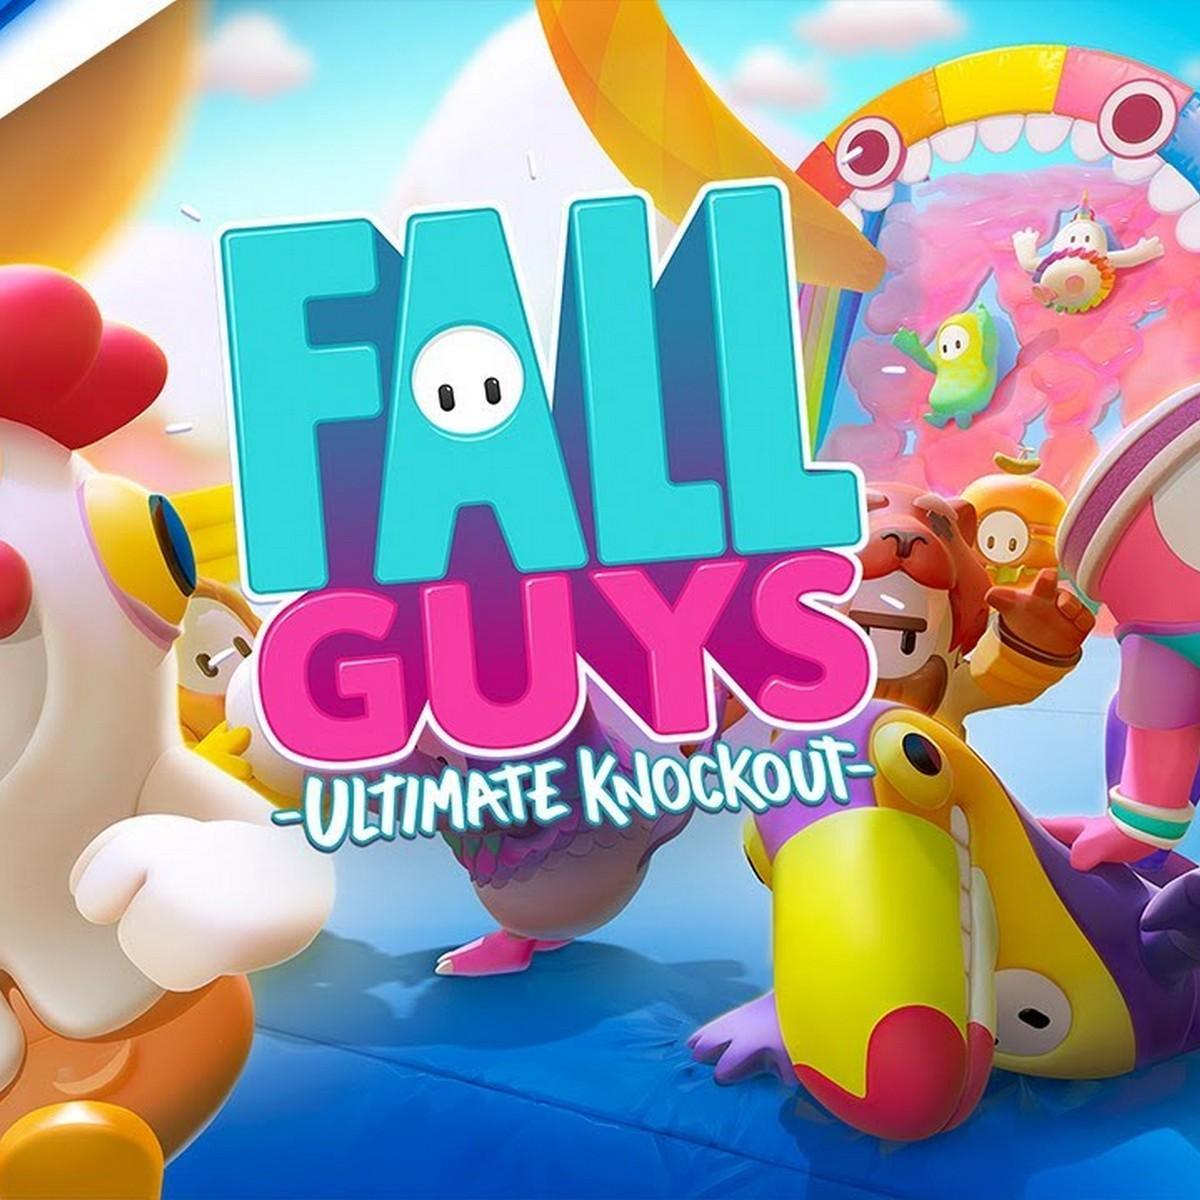 Fall Guys Ultimate Knockout APK MOD